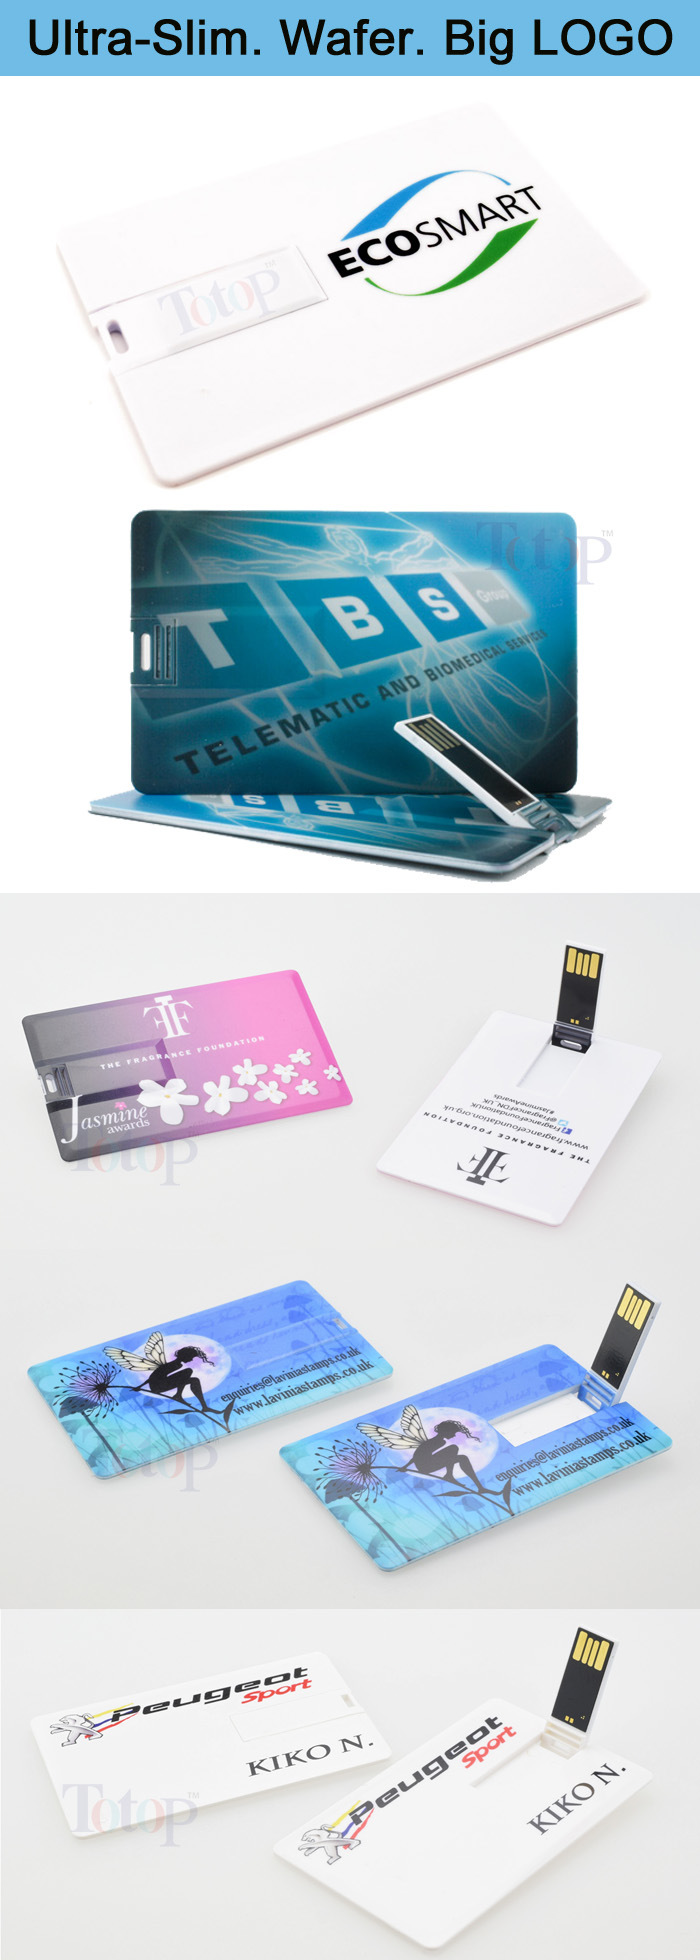 China ultra slim card usb drive business card usb drive china ultra slim card usb drive business card usb drive magicingreecefo Choice Image